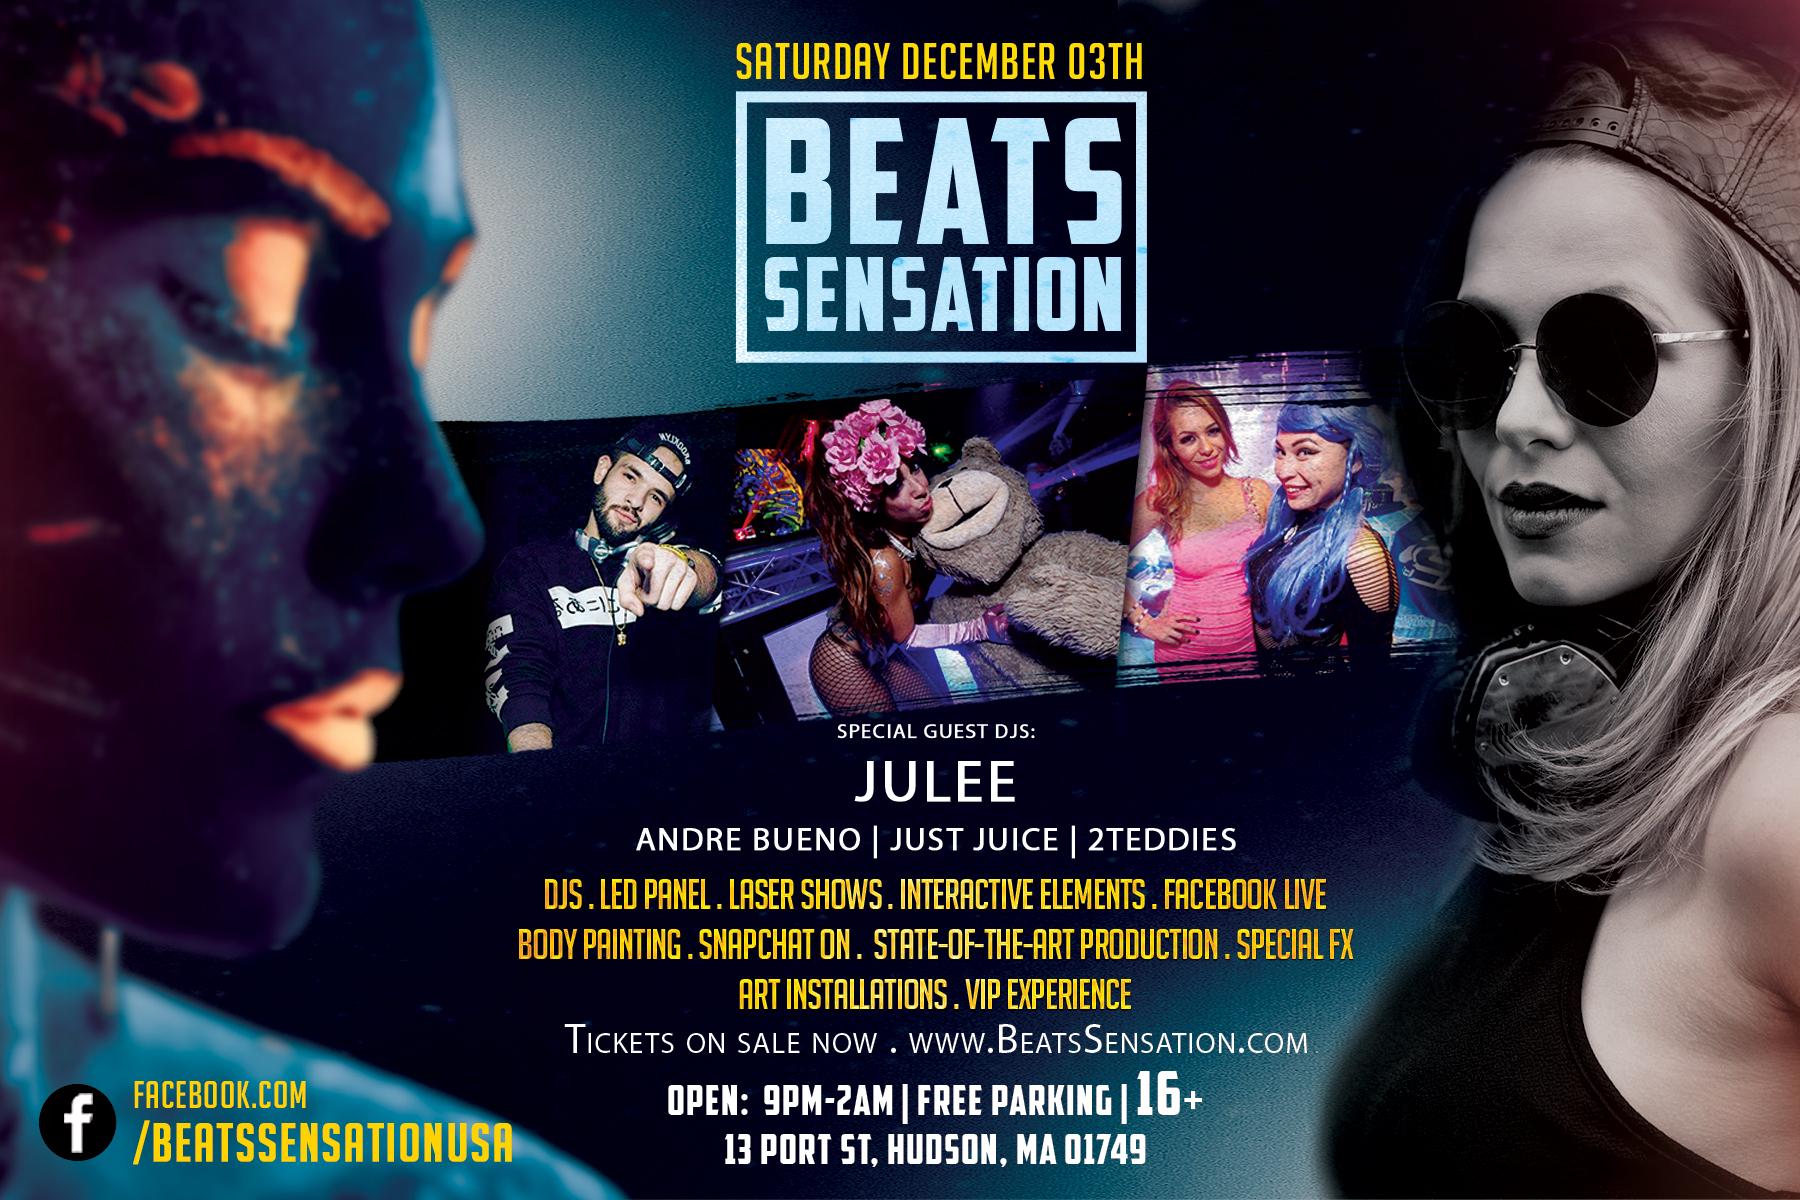 beats-sensation-flyer-december